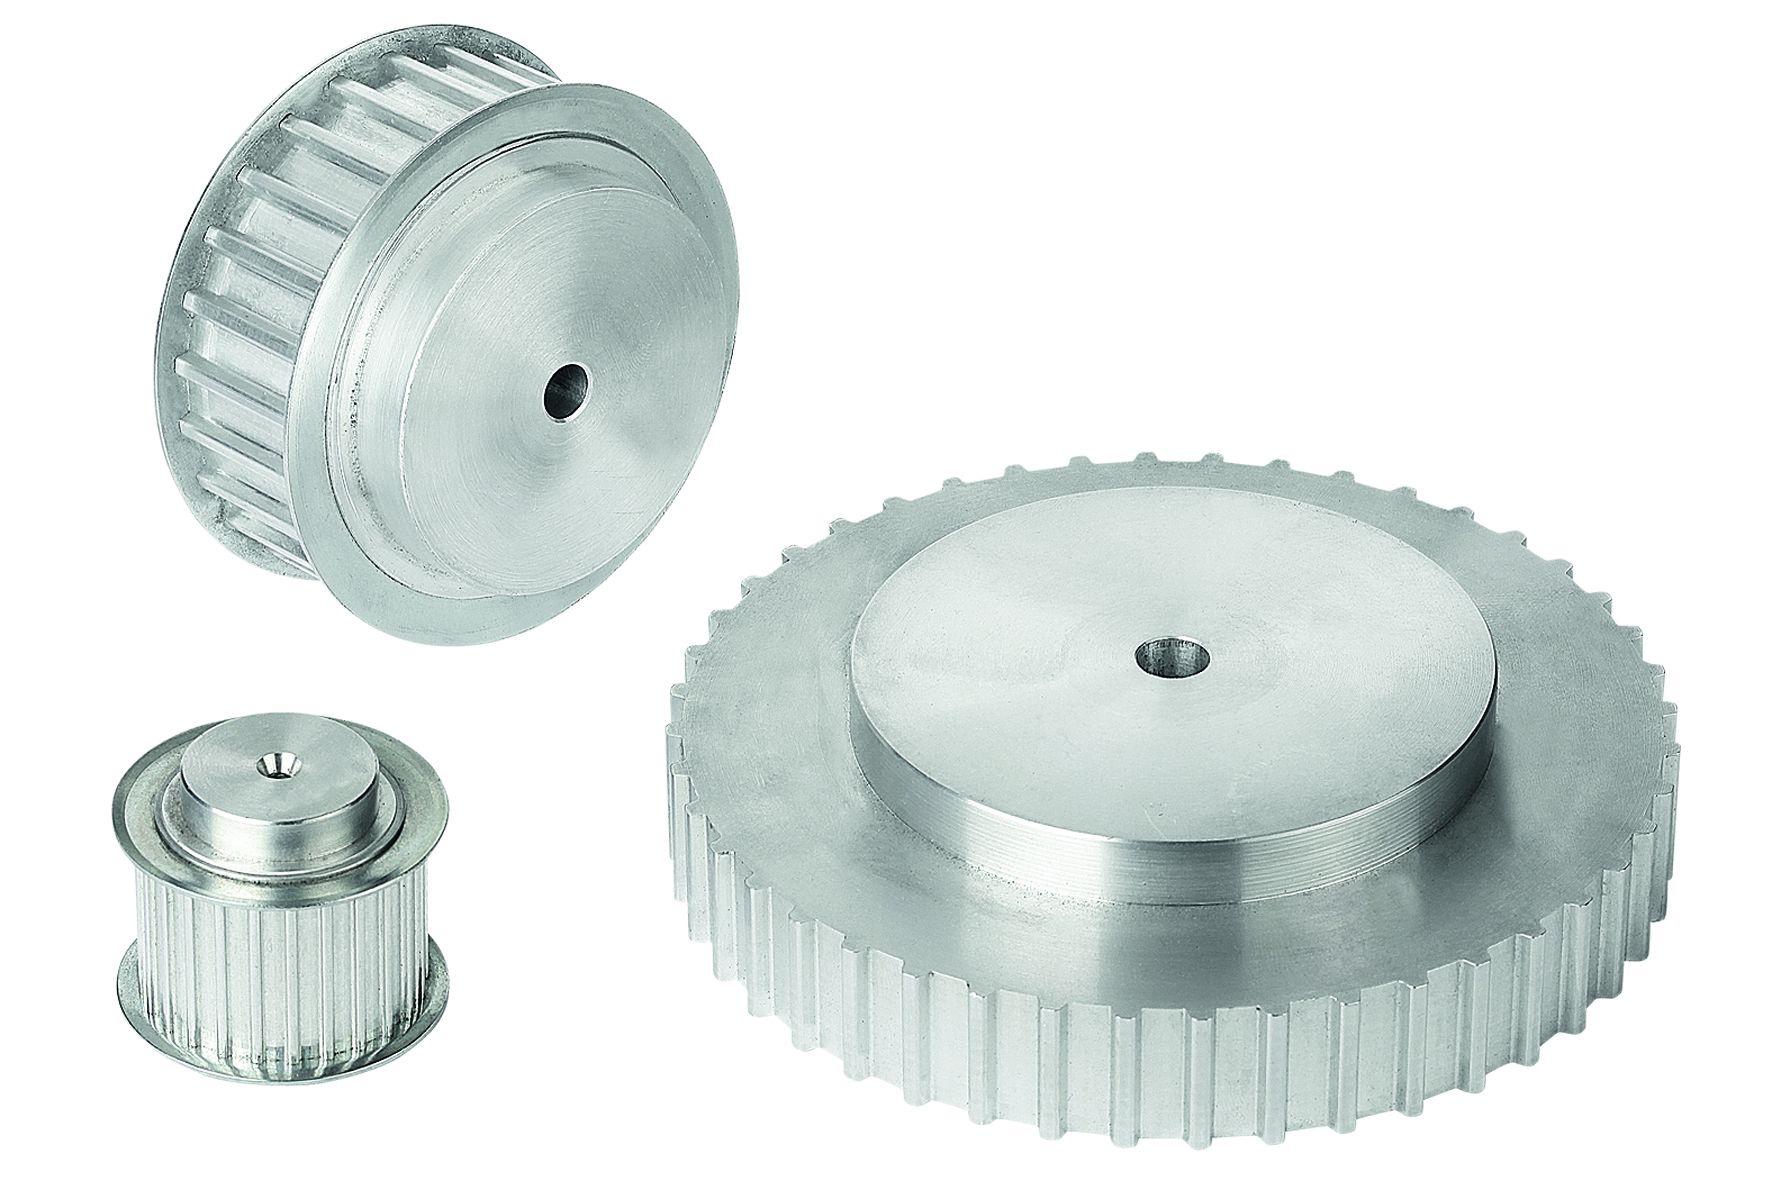 Werkstoff: Aluminium. Bordscheiben Stahl. Ausführung: Aluminium, blank. Stahl verzinkt. Hinweis: Standard T-Profil nach